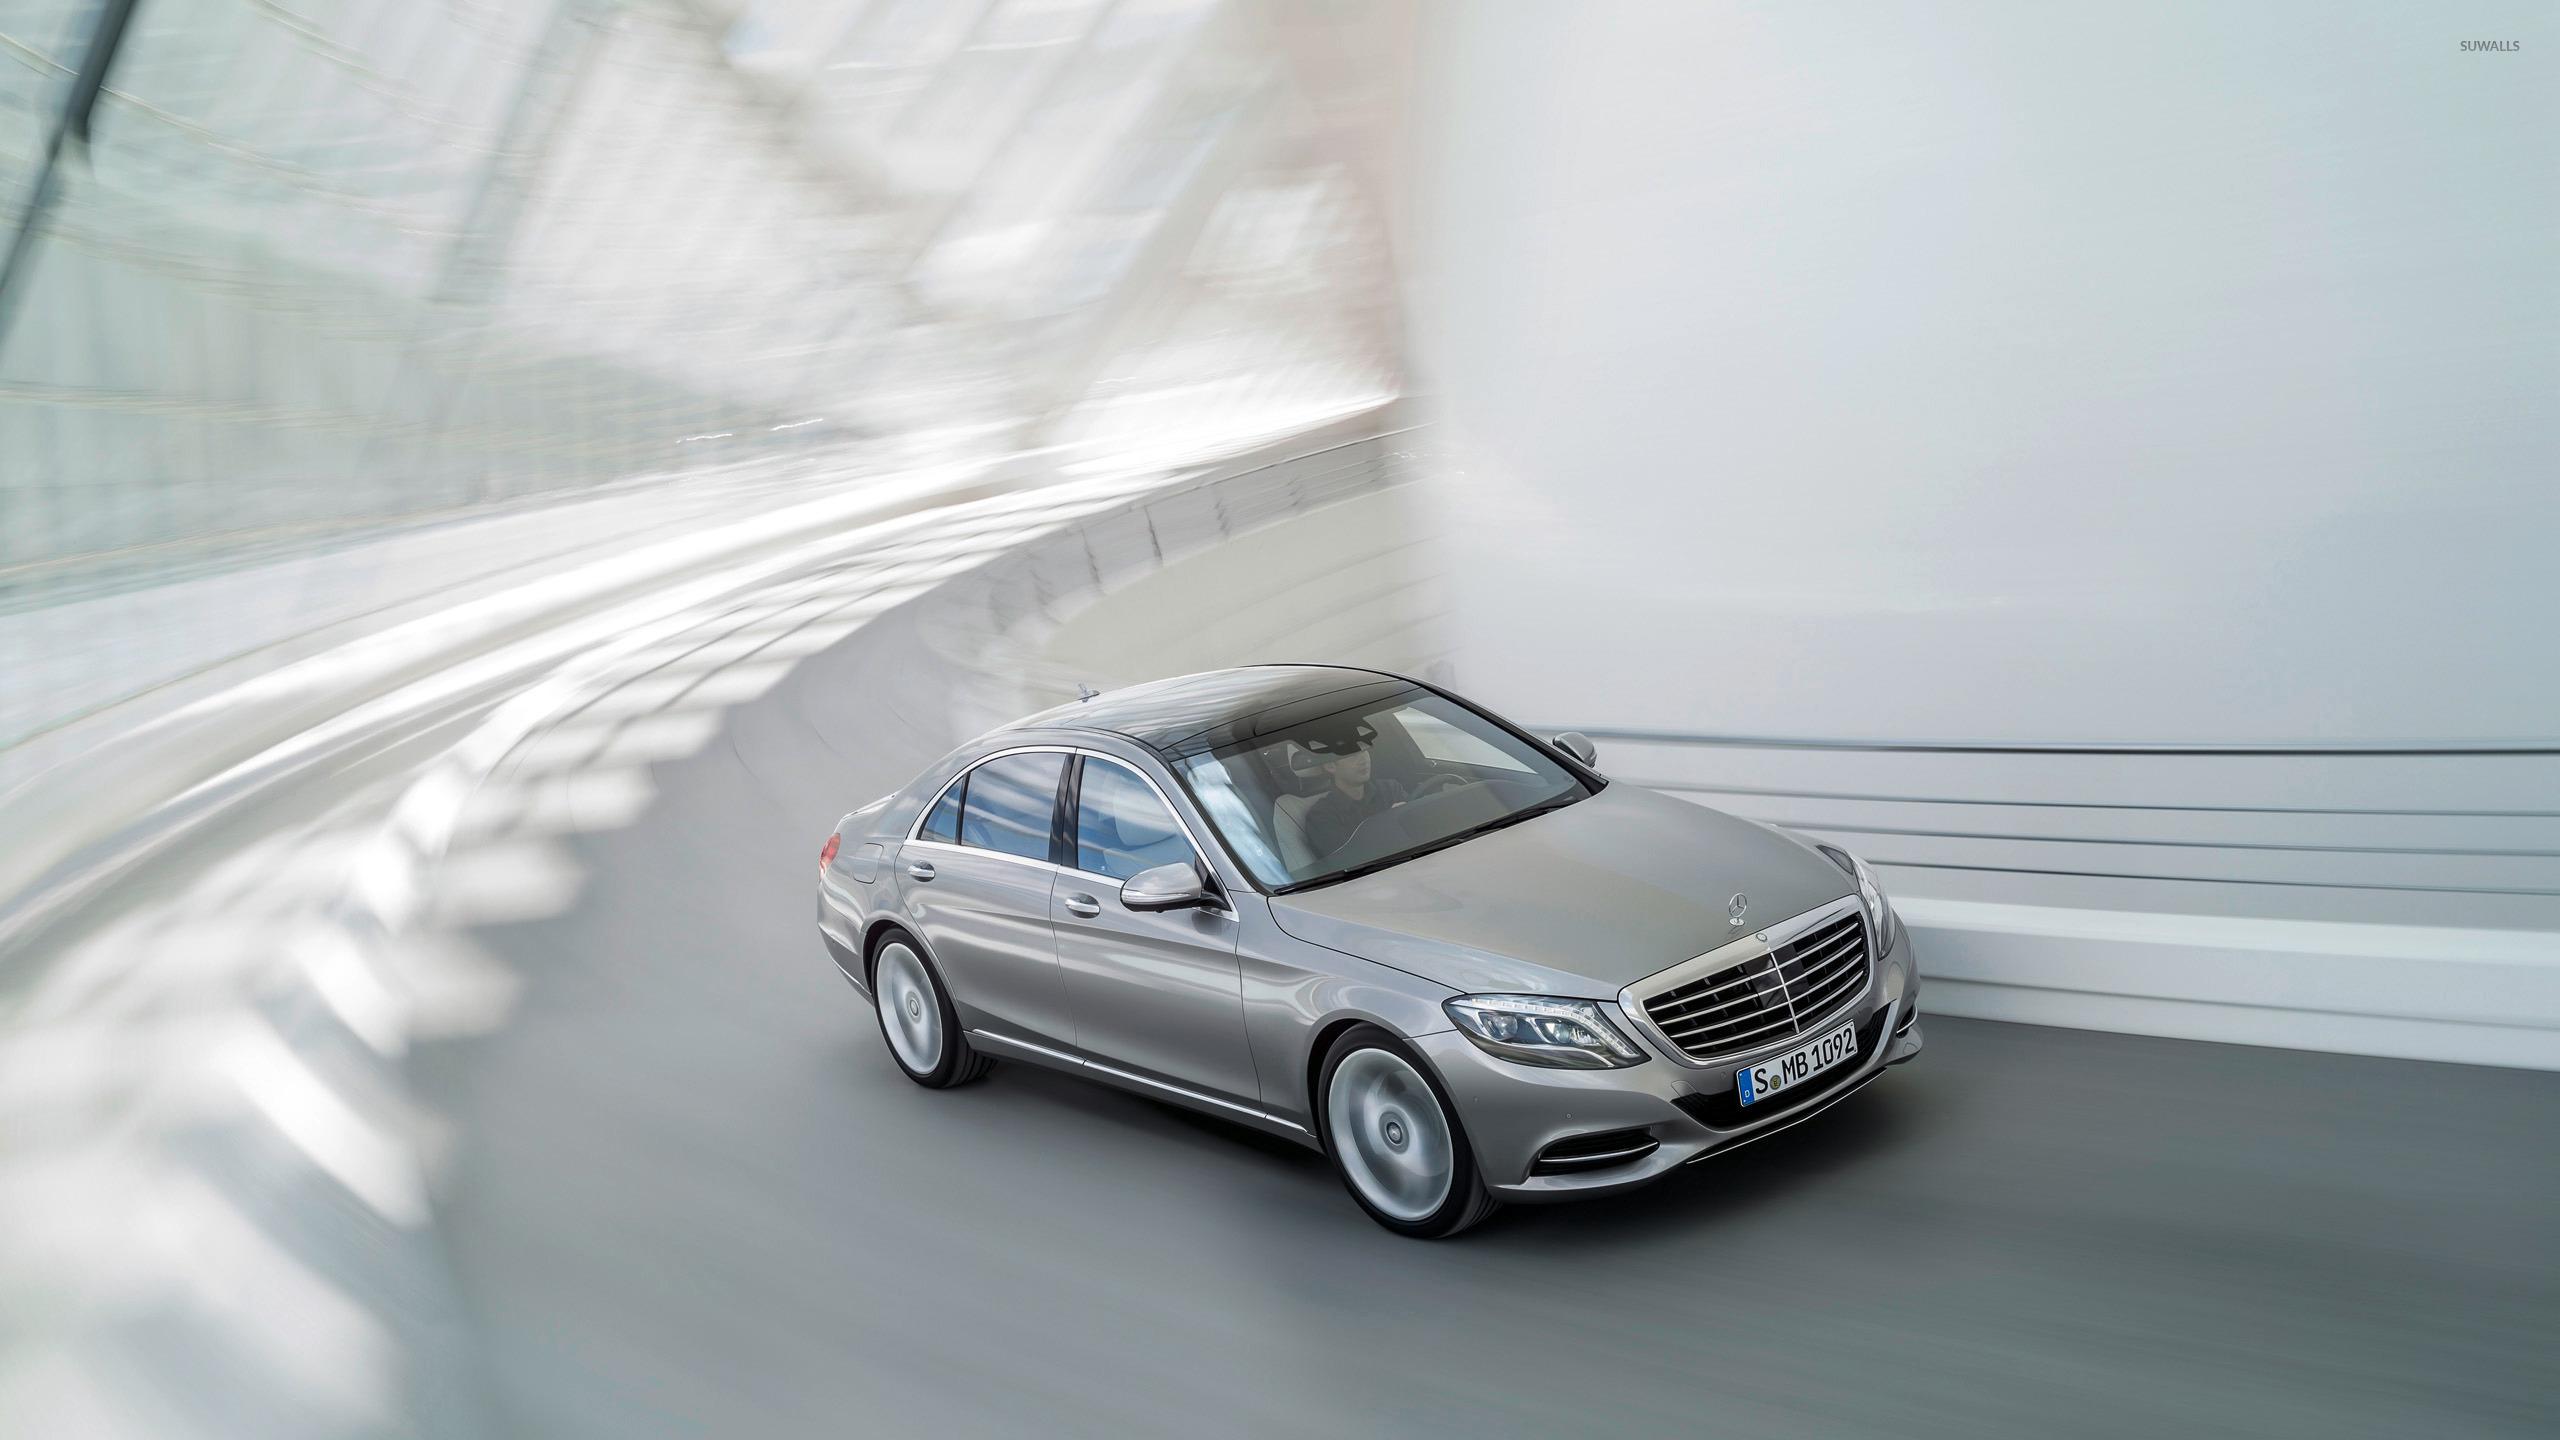 2013 mercedes benz s400 2 wallpaper car wallpapers for Mercedes benz s400